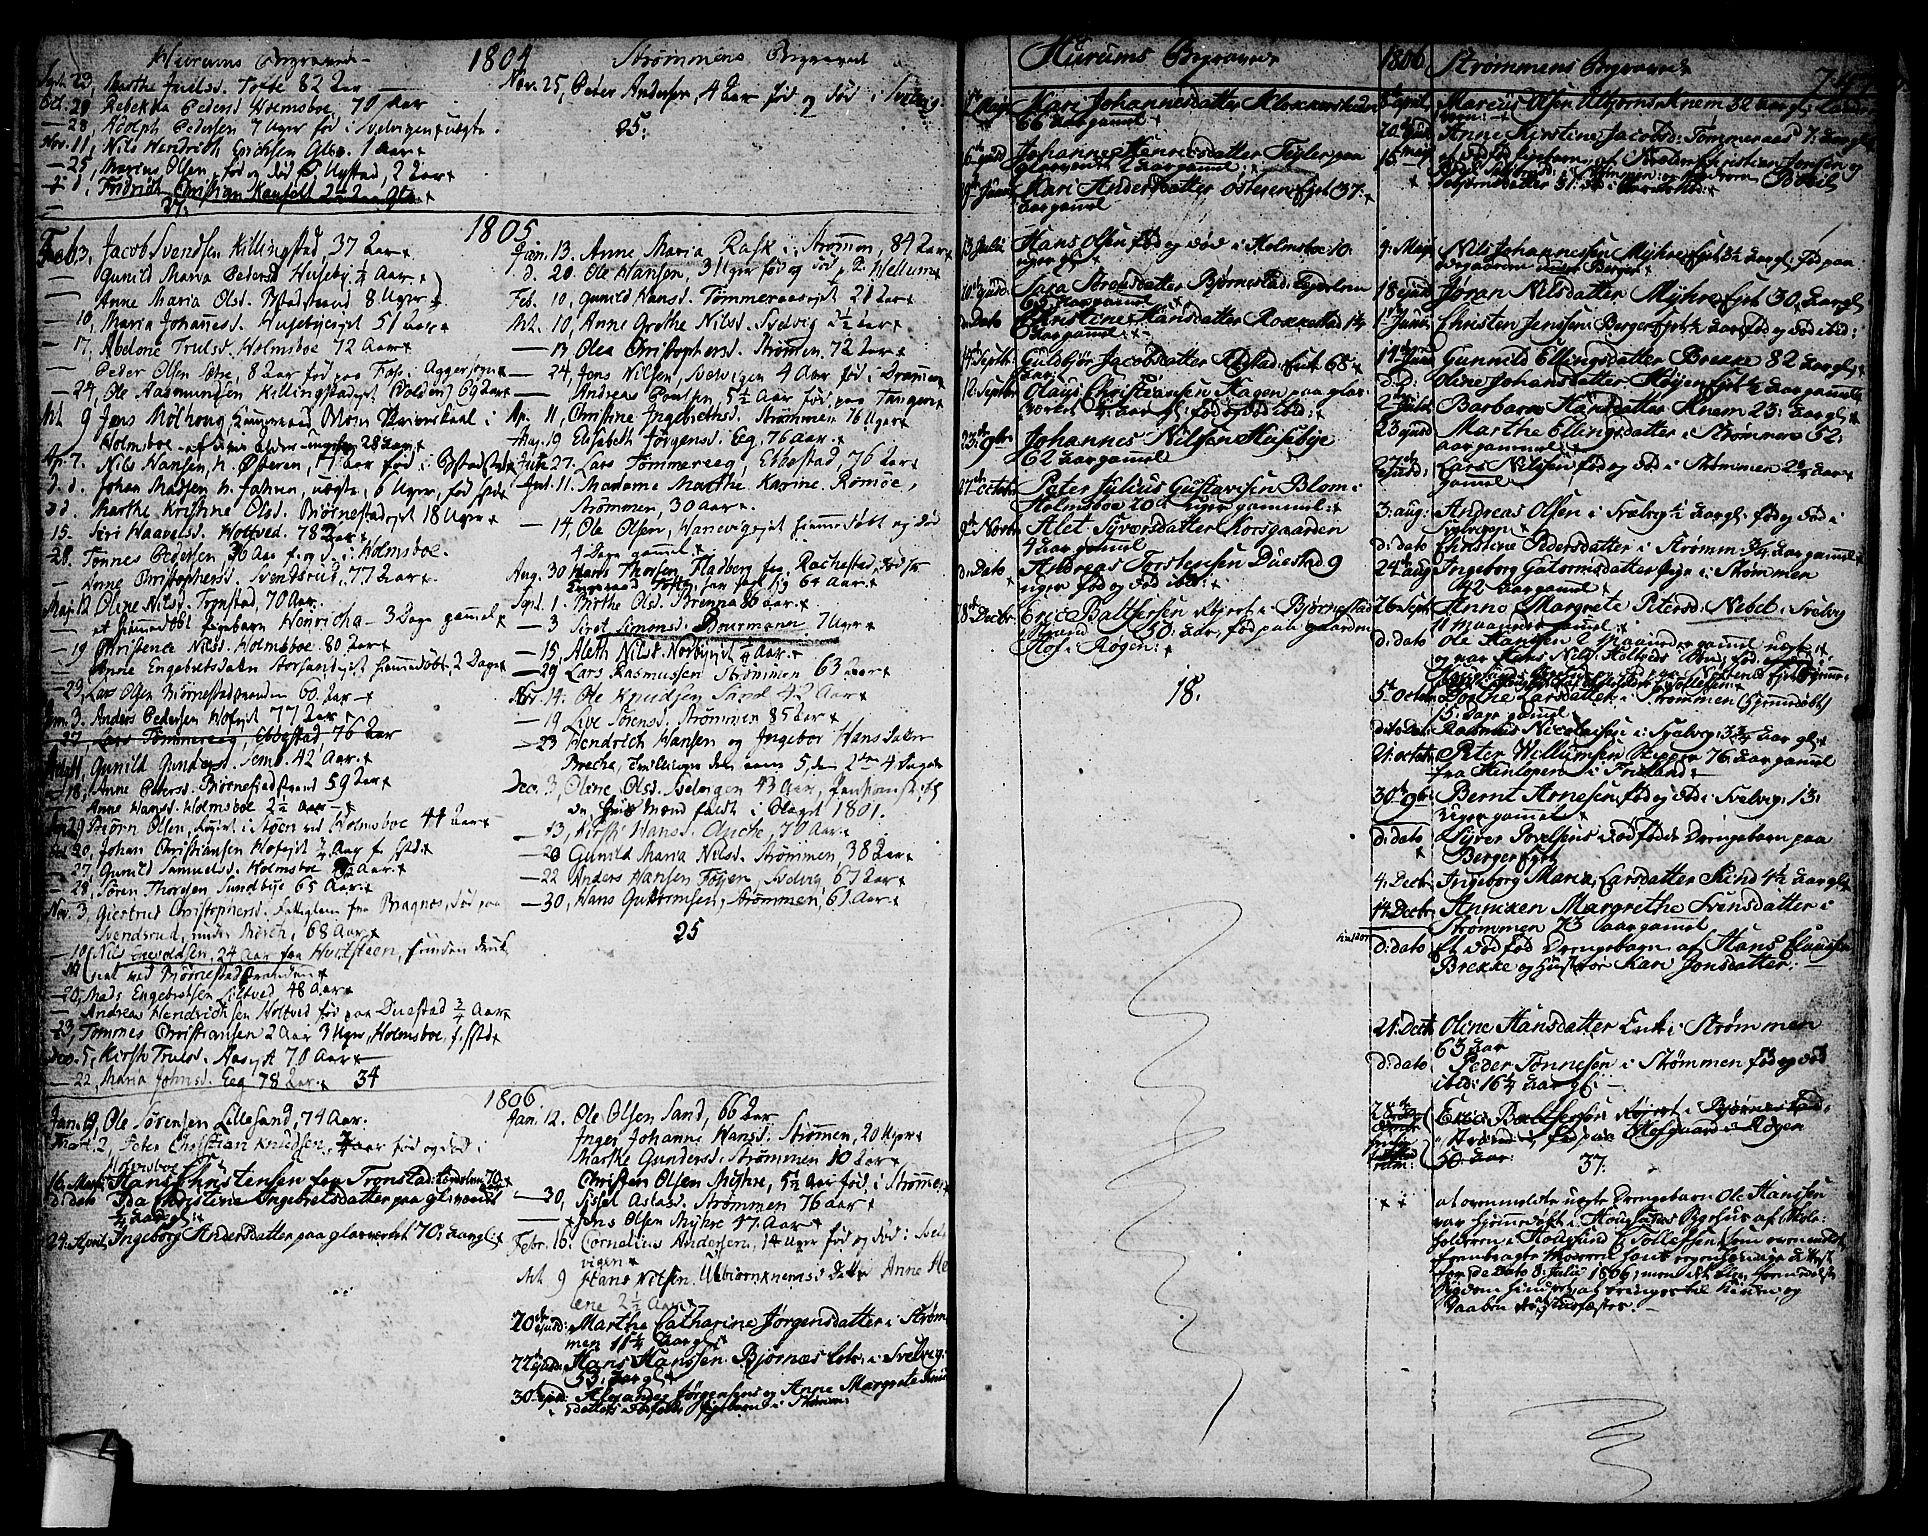 SAKO, Hurum kirkebøker, F/Fa/L0007: Ministerialbok nr. 7, 1771-1810, s. 247